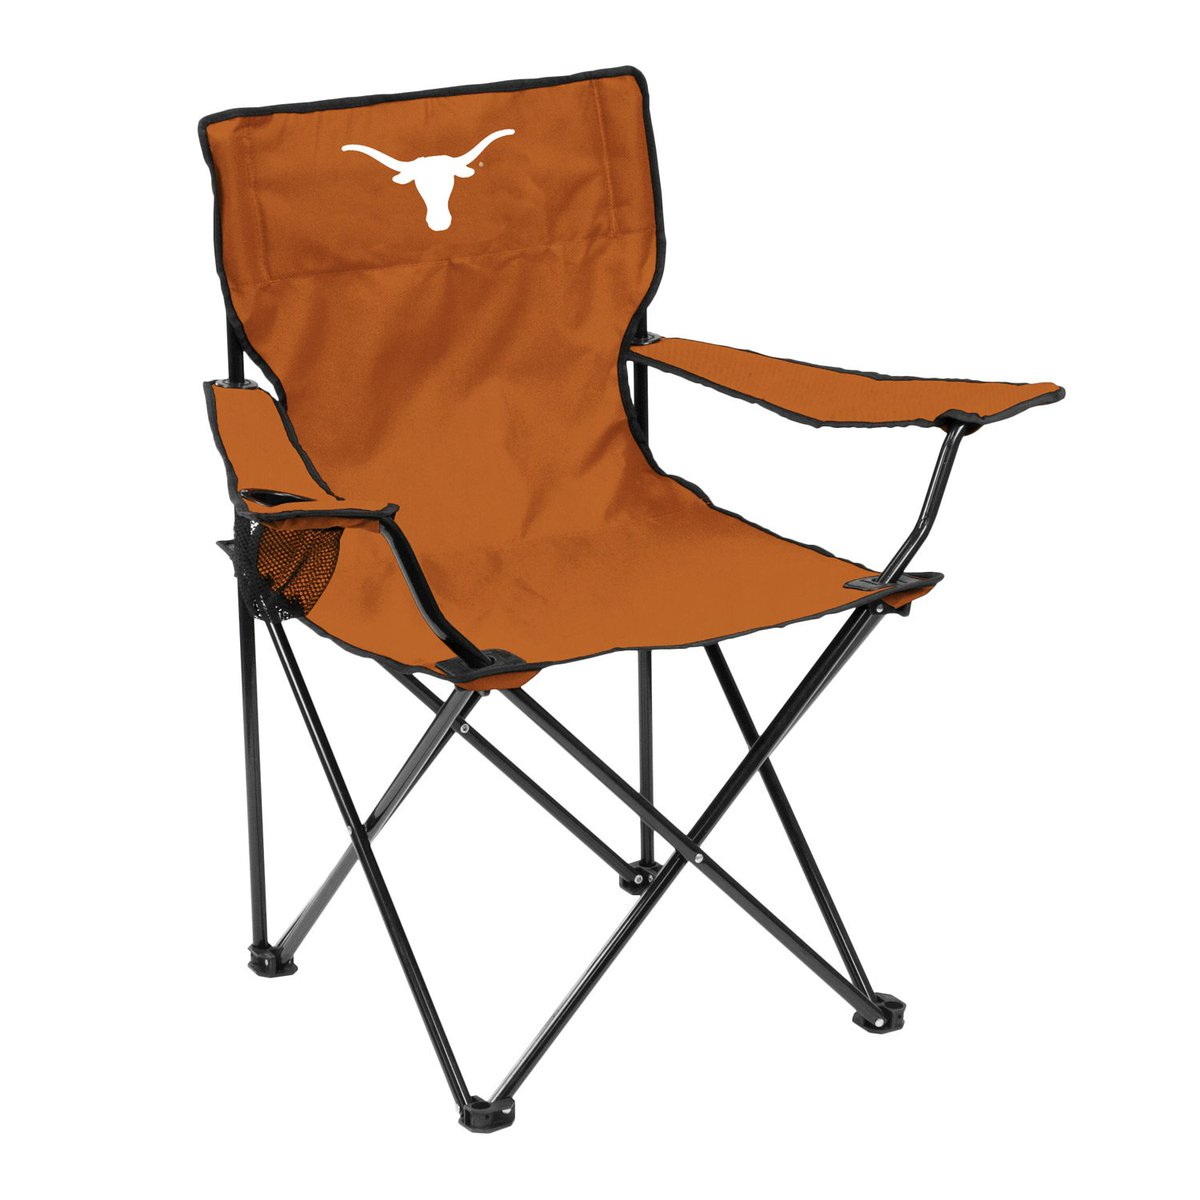 Texas Quad Chair #WednesdayWisdom https://t.co/SDojGMskK0 https://t.co/FrTlCM7qGa